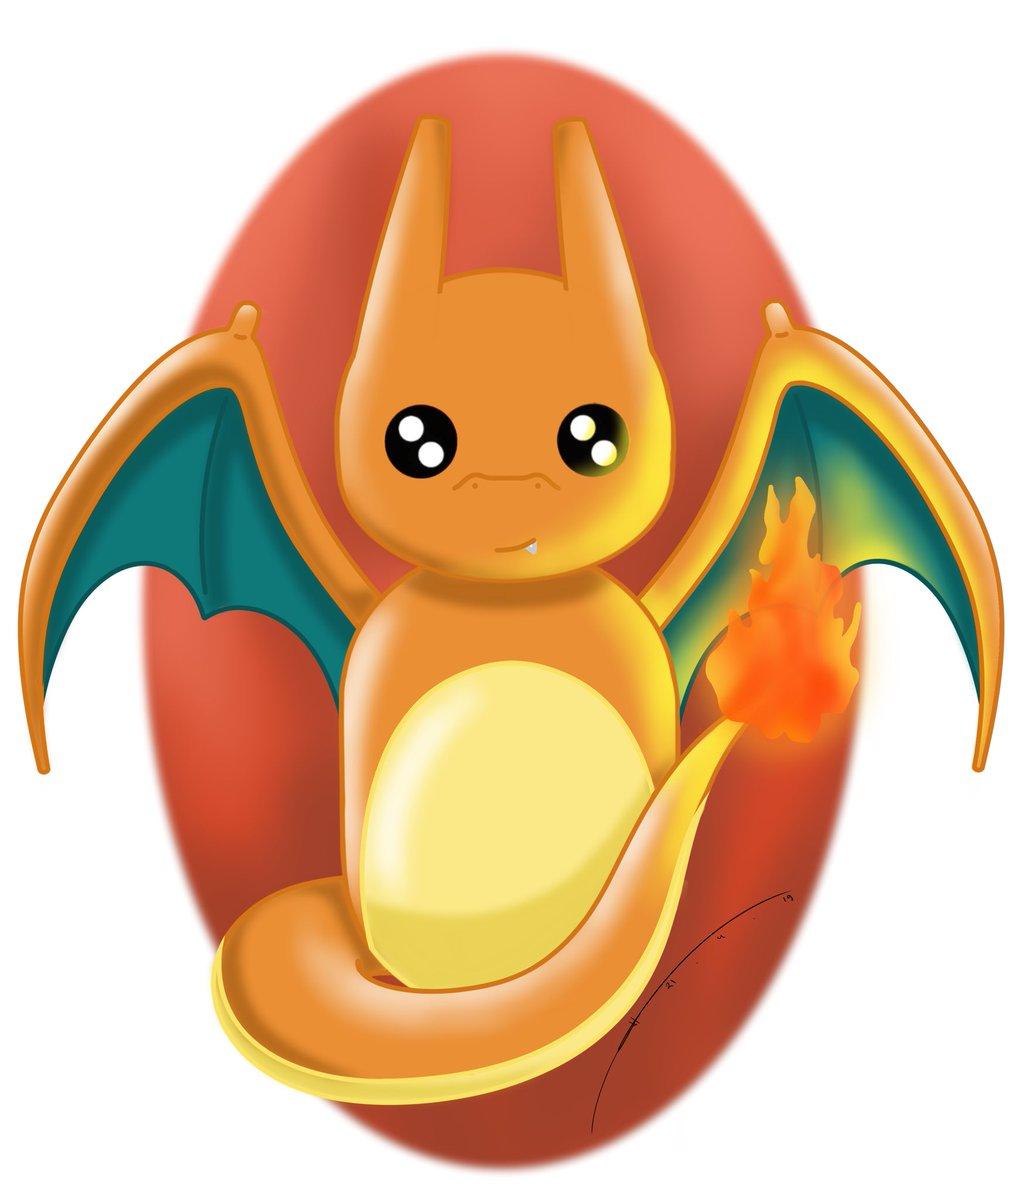 My new cuter style ^^  Do u like it?  #pokemon #kawaii #cute #charizard